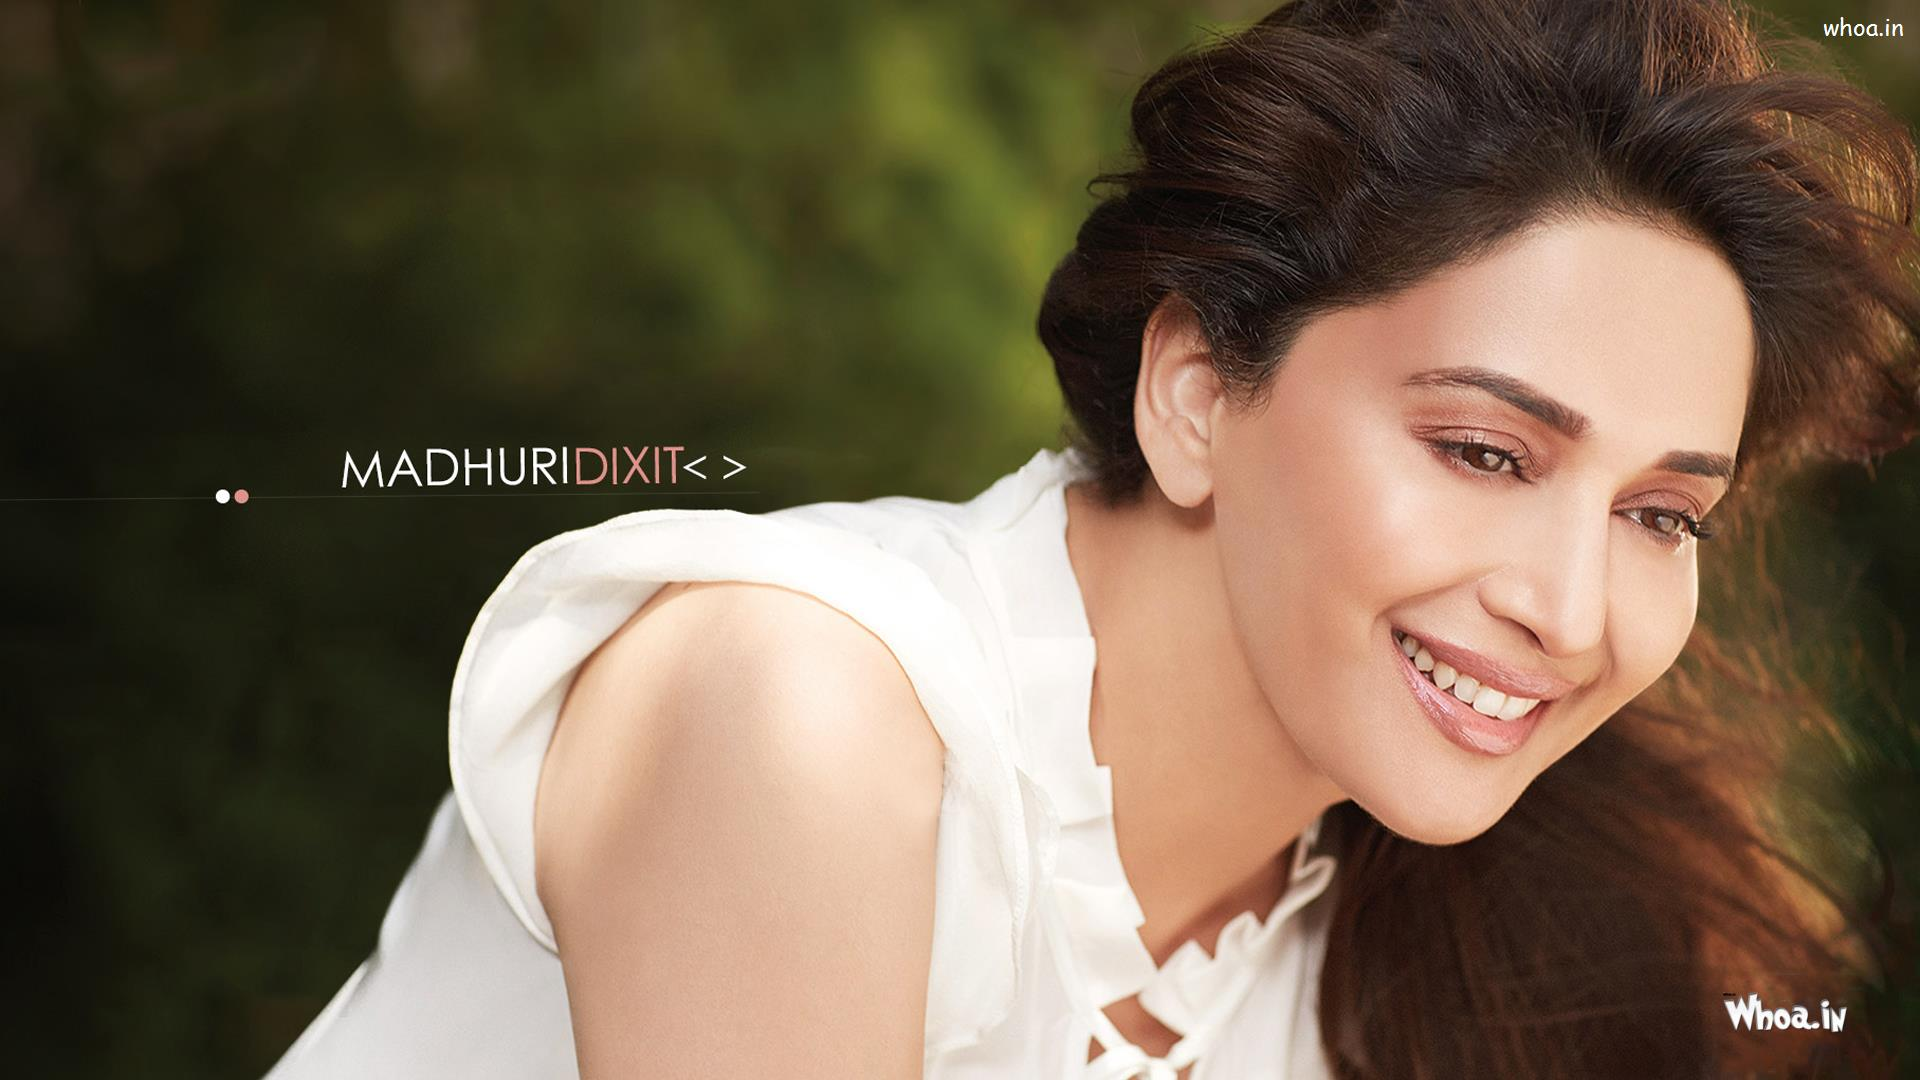 41 best Madhuri Dixit Nene images on Pinterest | Madhuri dixit ...